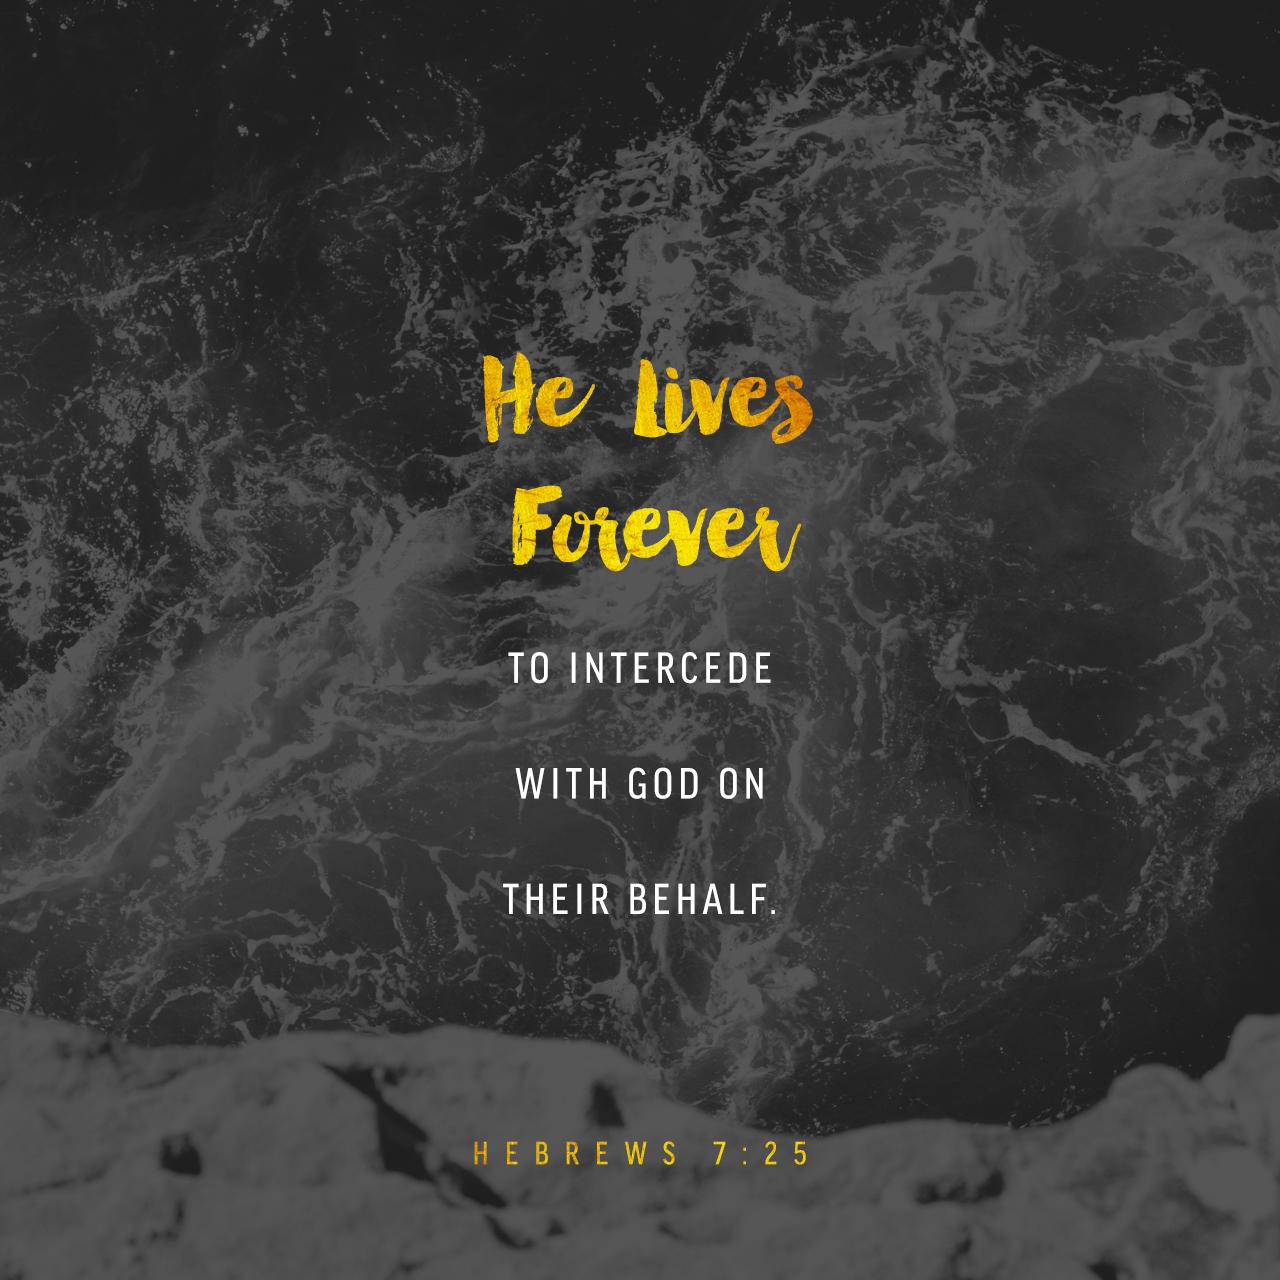 ScriptureArt_0817_-_Hebrews_7_25_NLT_English_157x157.jpg